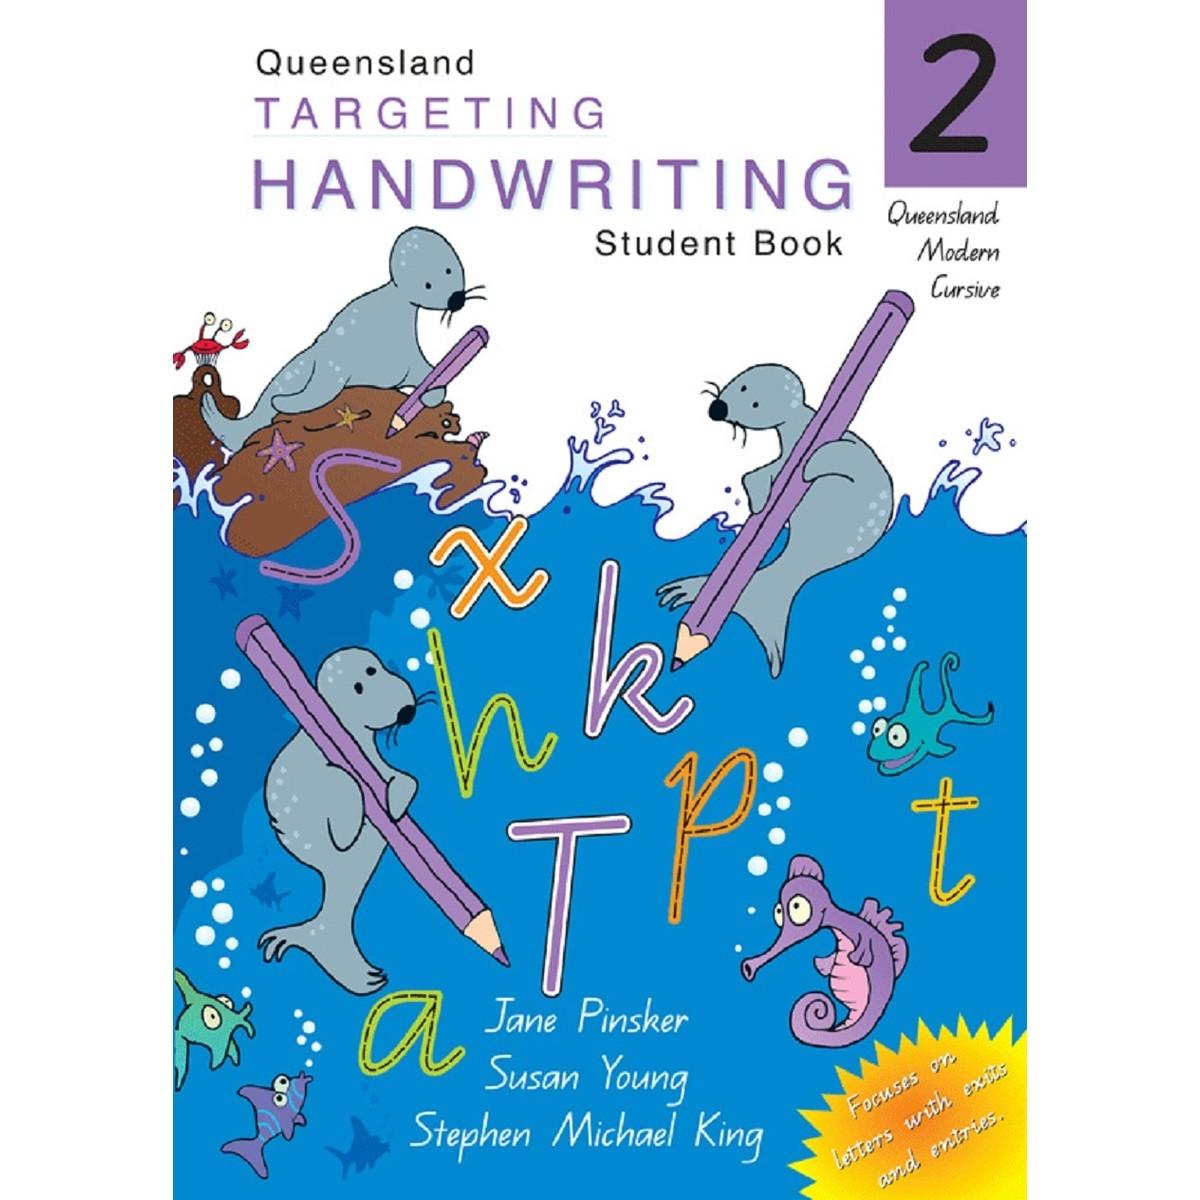 Qld Targeting Handwriting Student Book Year 2